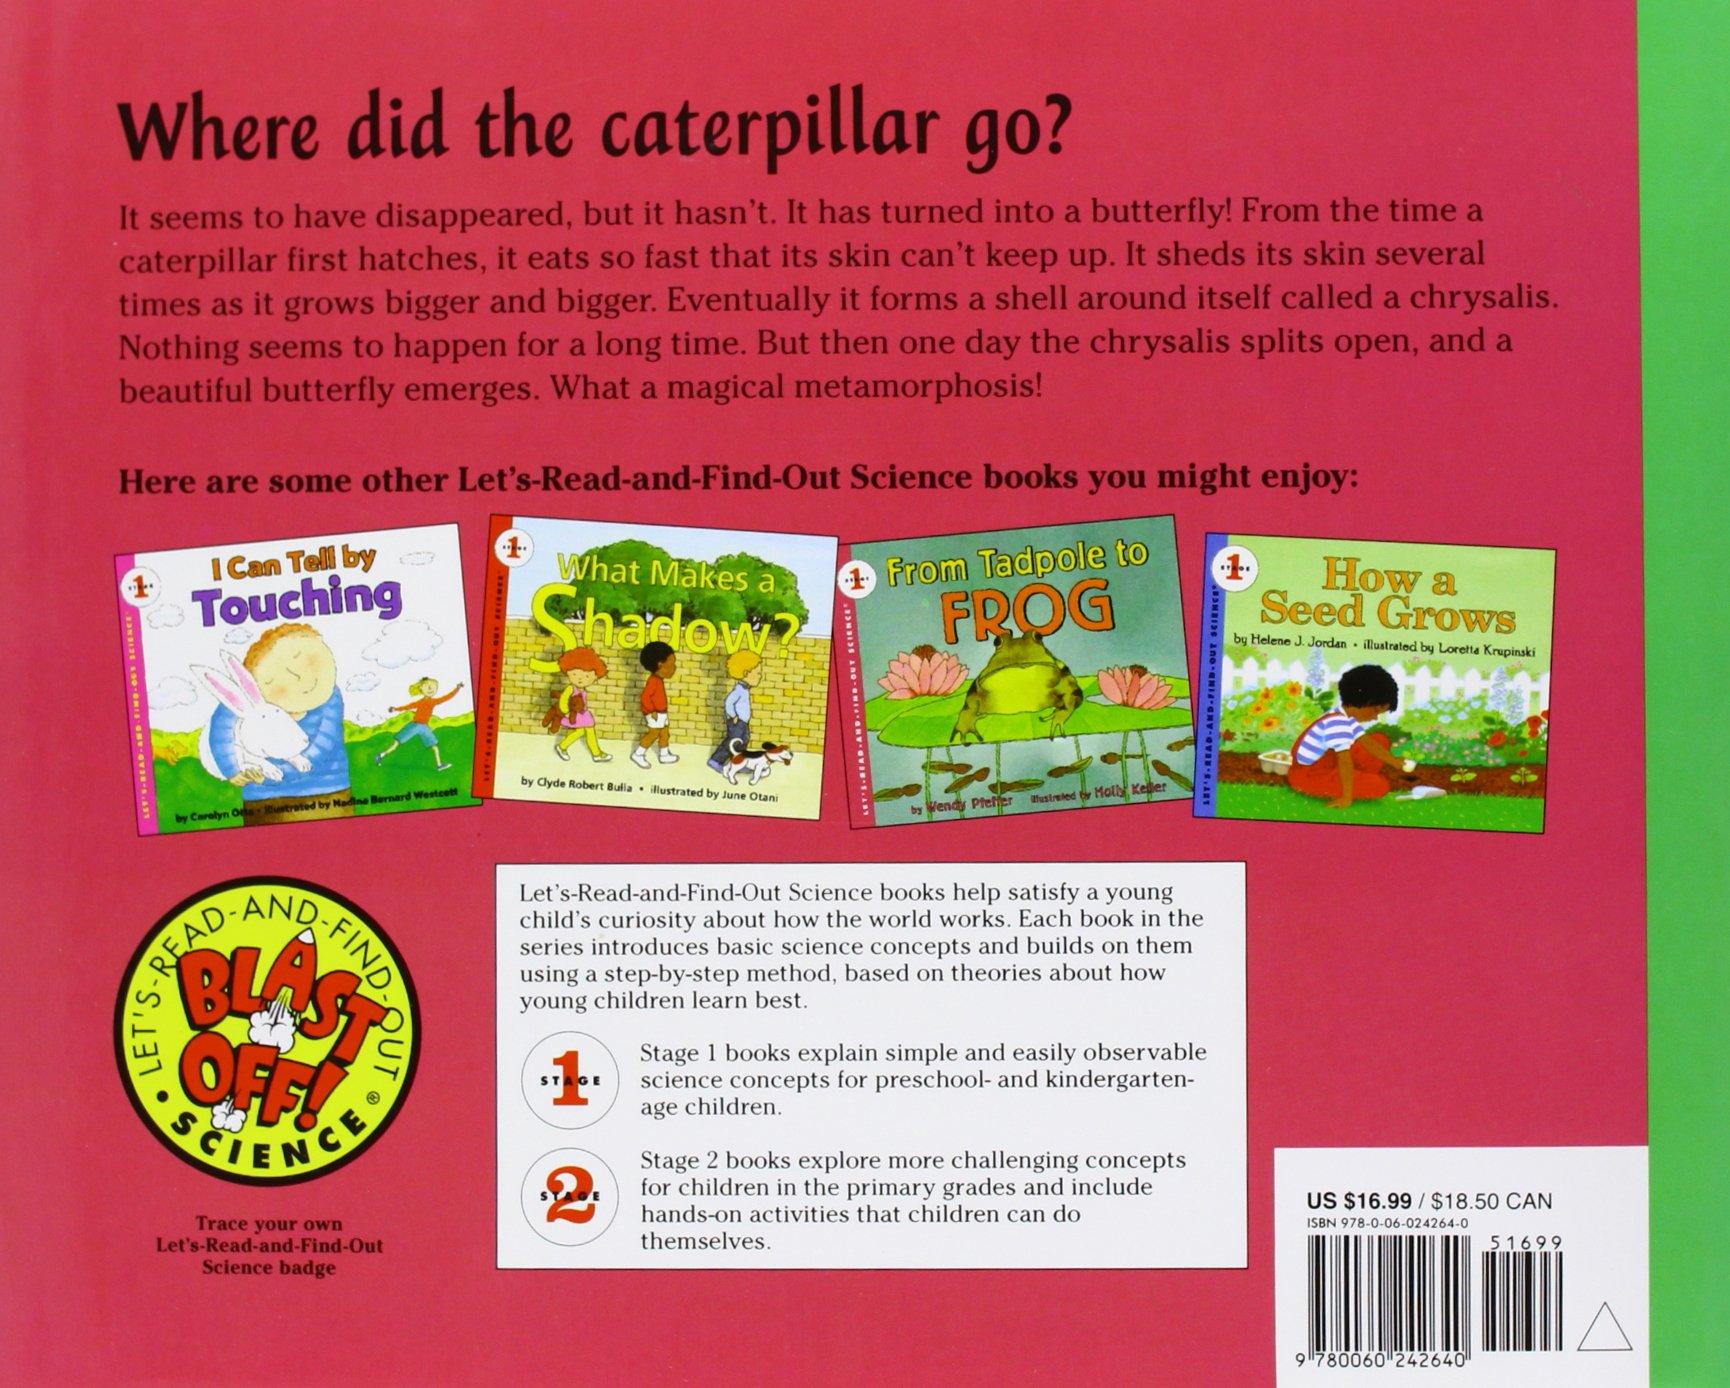 Amazon: From Caterpillar To Butterfly (let'sreadandfindout Science  1) (9780060242640): Deborah Heiligman, Bari Weissman: Books